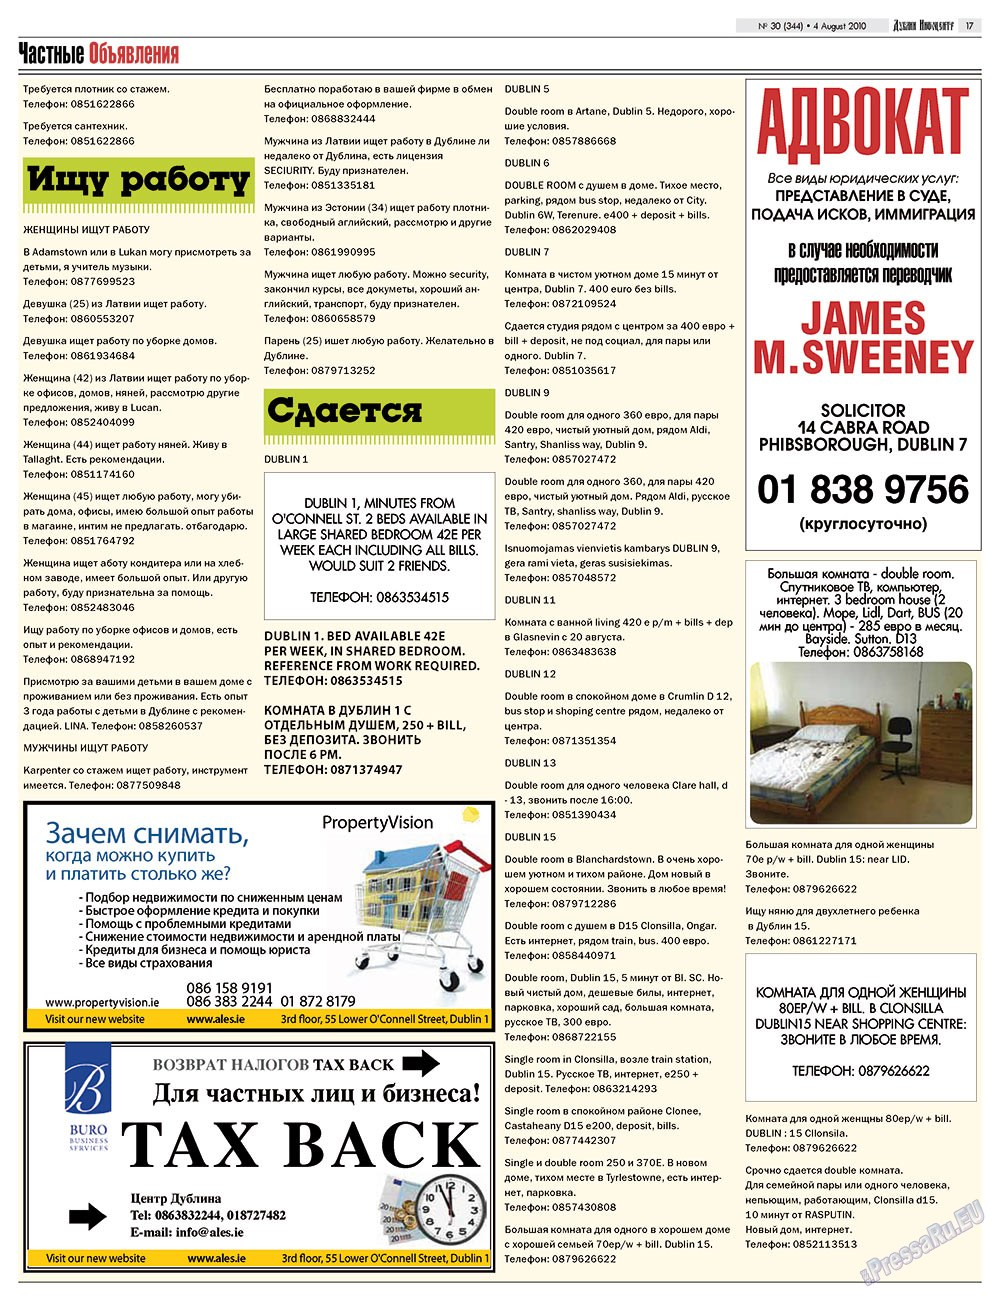 Дублин инфоцентр (газета). 2010 год, номер 30, стр. 17